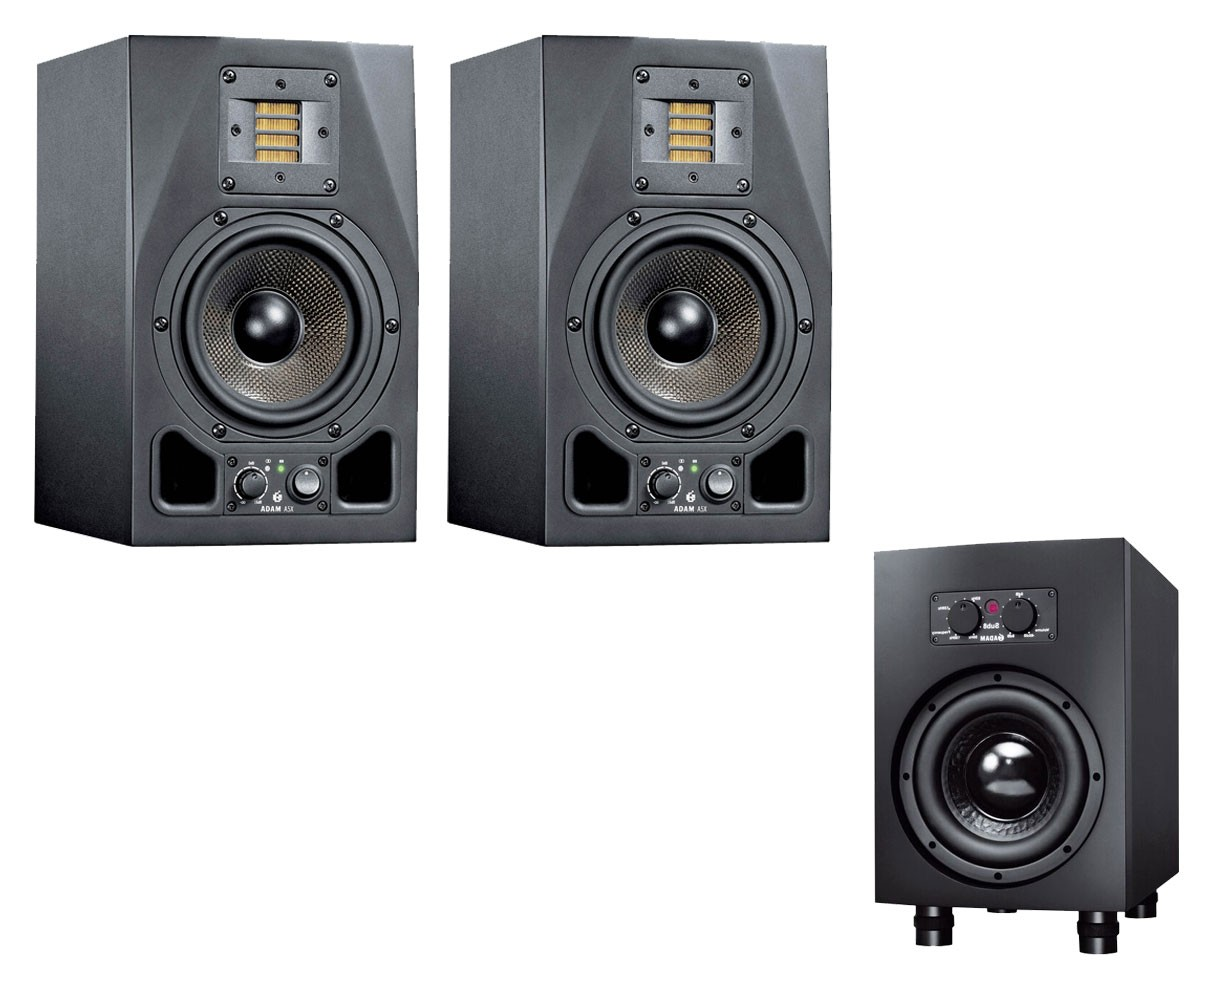 2x ADAM A5X + Sub8 2.1 System